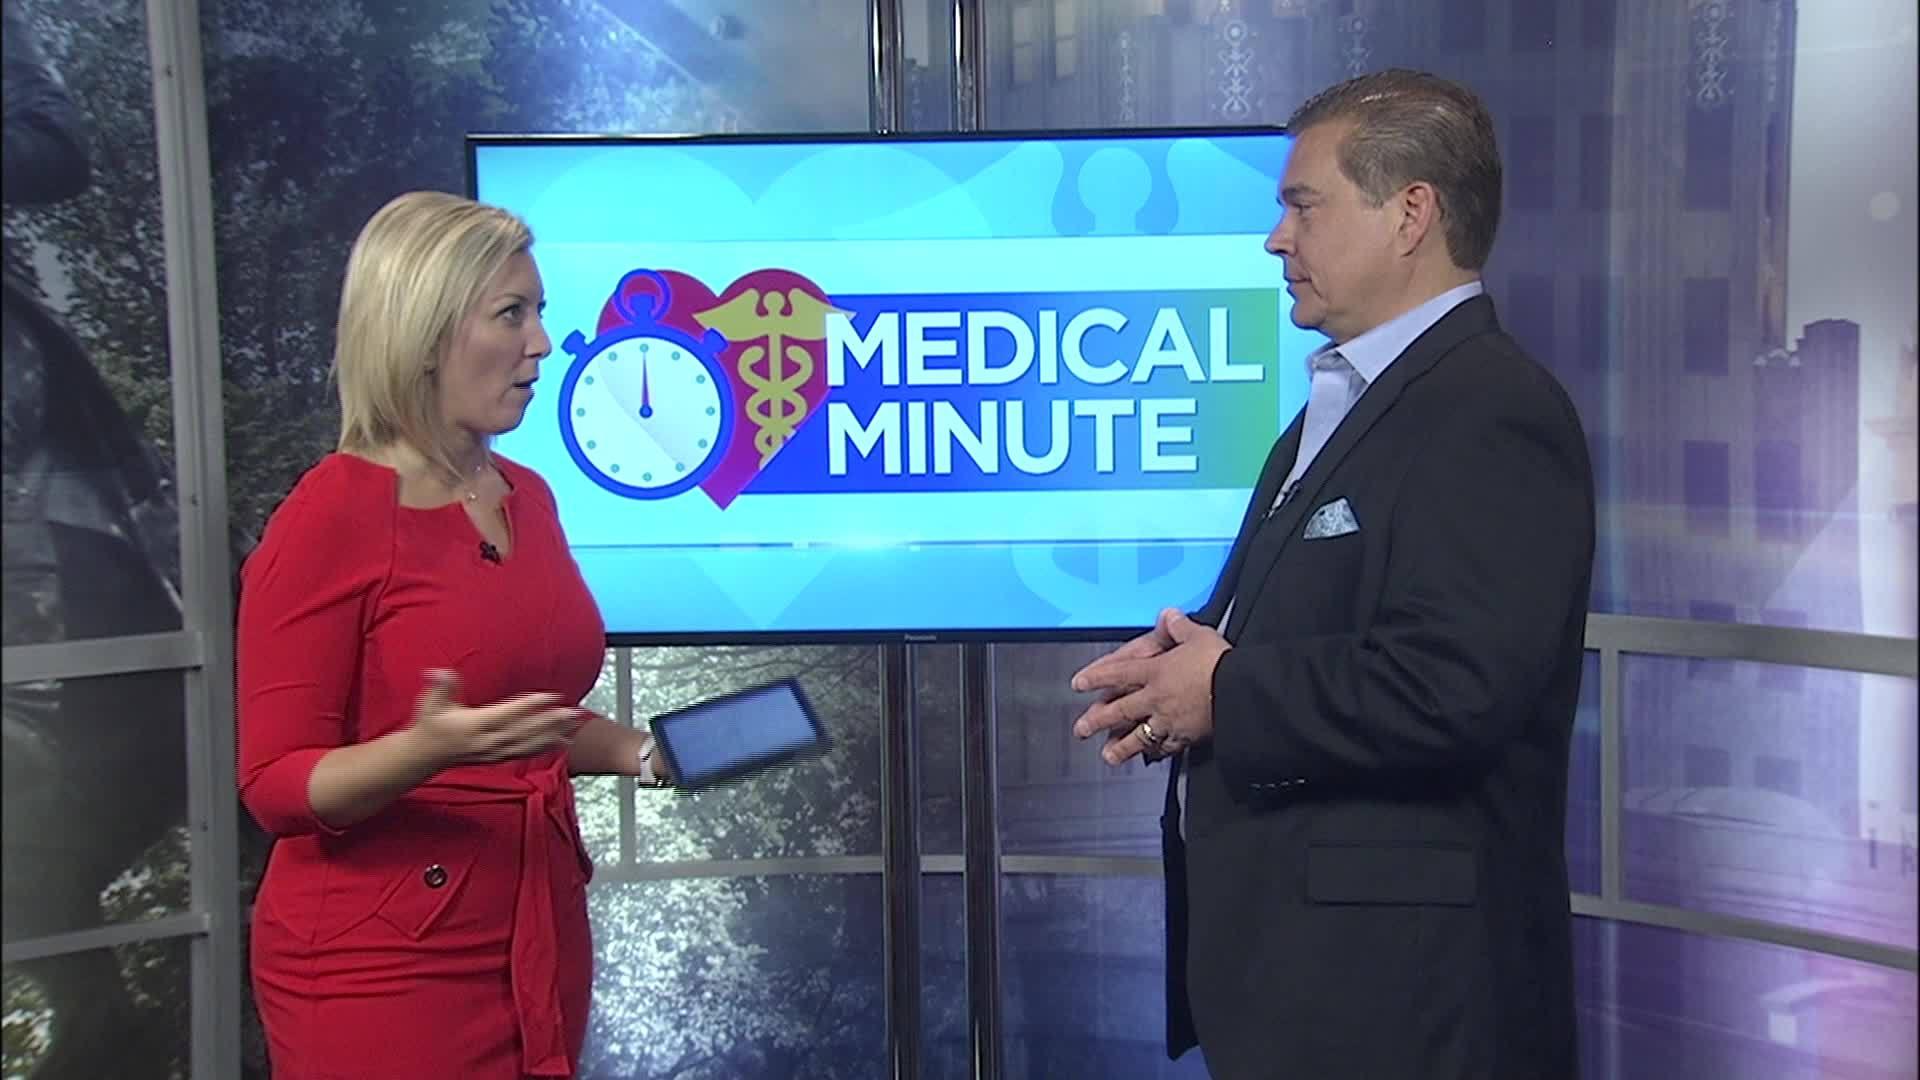 Medical Minute - Preventing back injuries